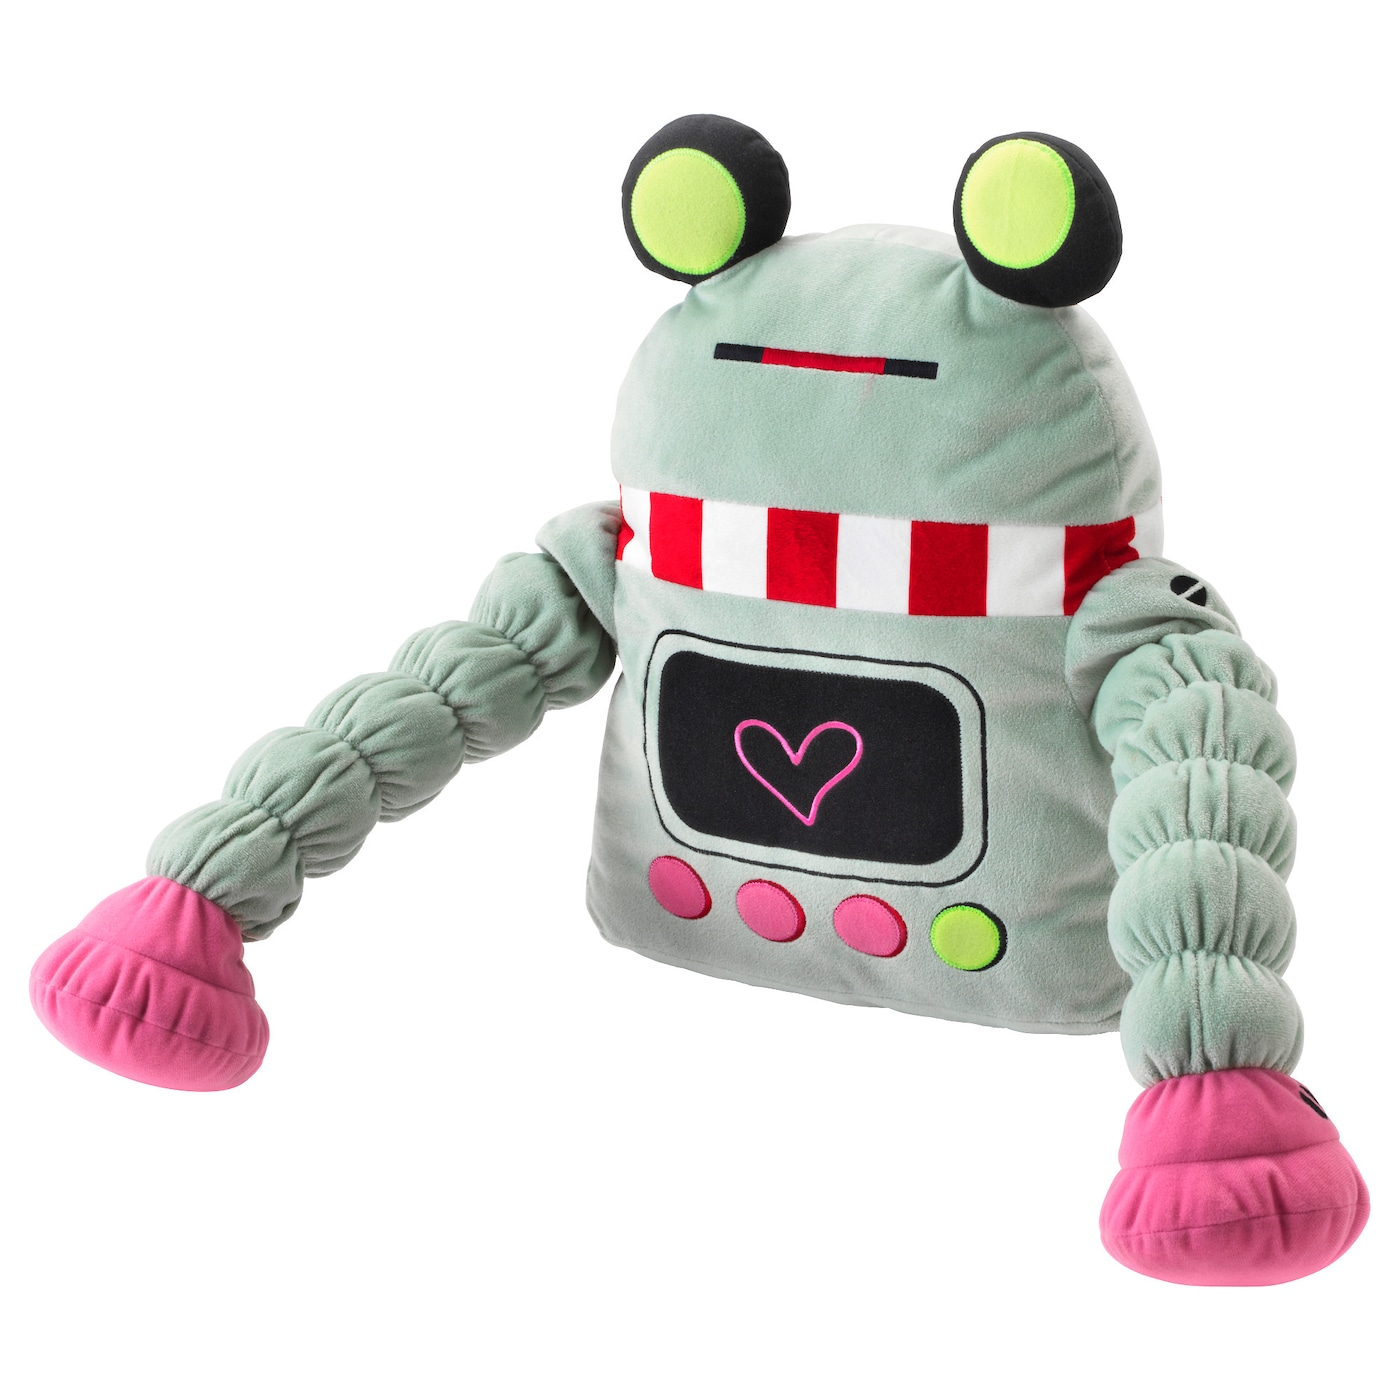 Soft Toys Product : Lattjo soft toy robot light green ikea